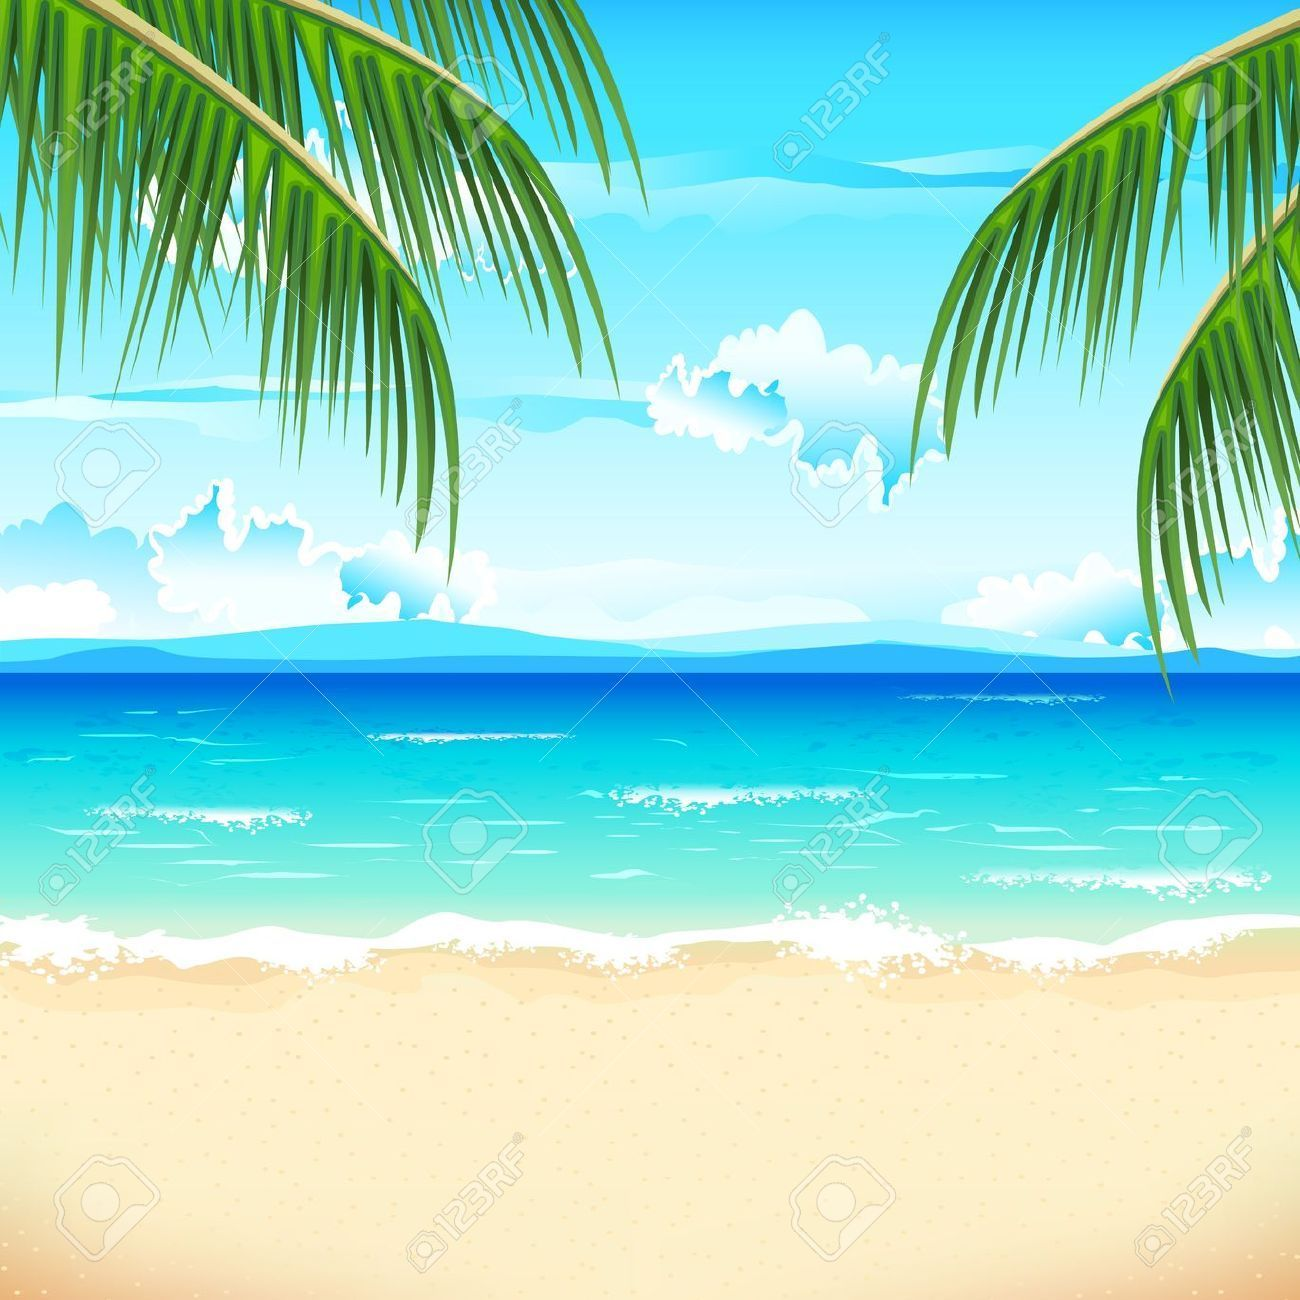 Beach backgrounds clipart 8 » Clipart Portal.